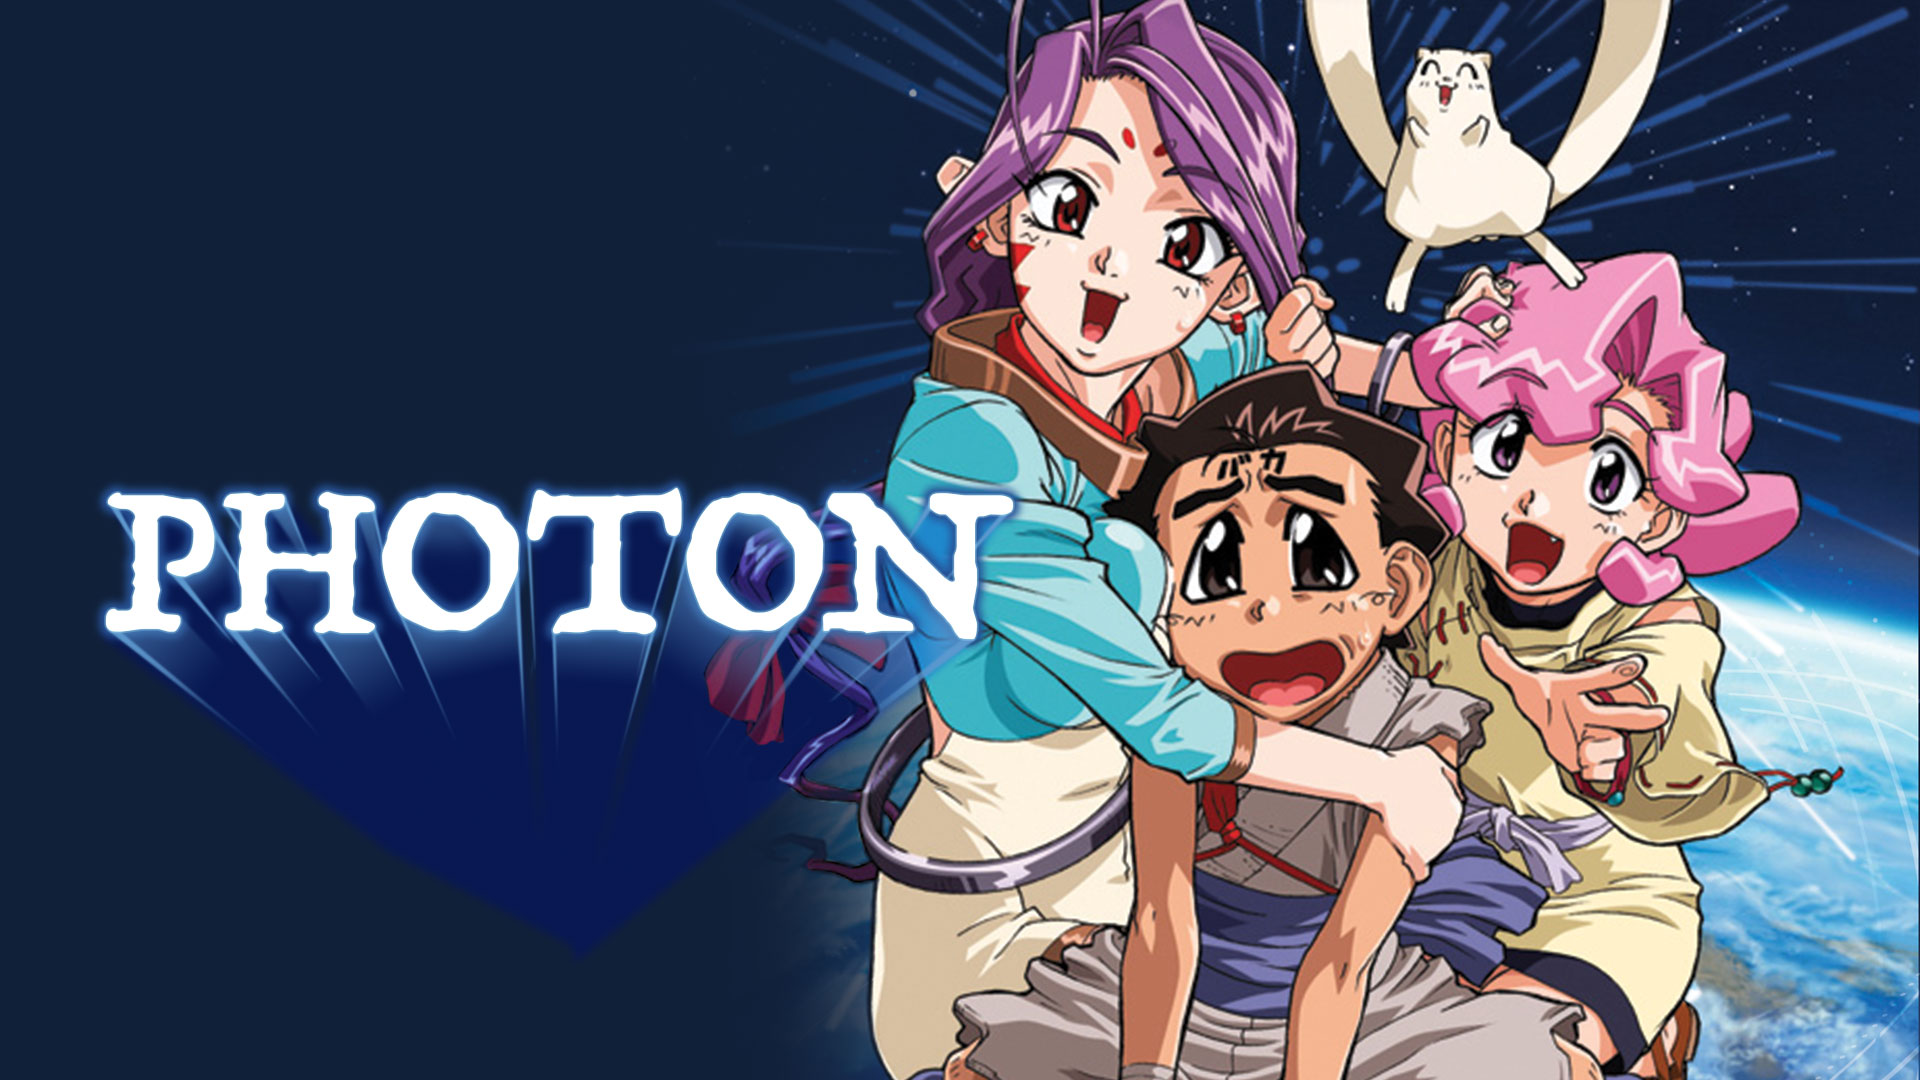 Photon the Idiot Adventures